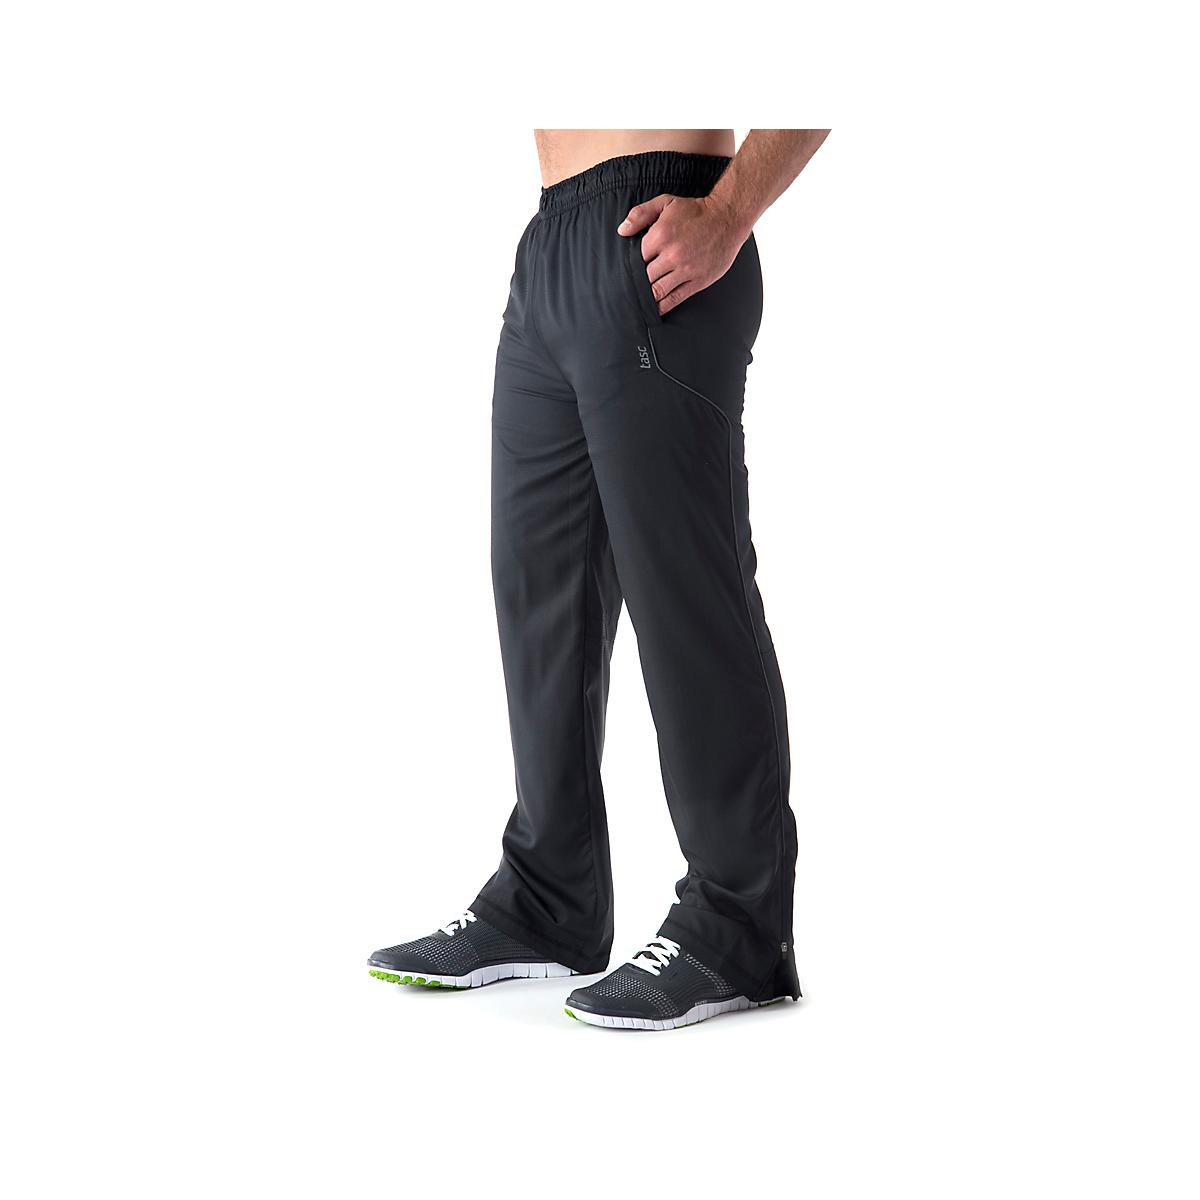 Men's Tasc Performance�Greenwich Pant